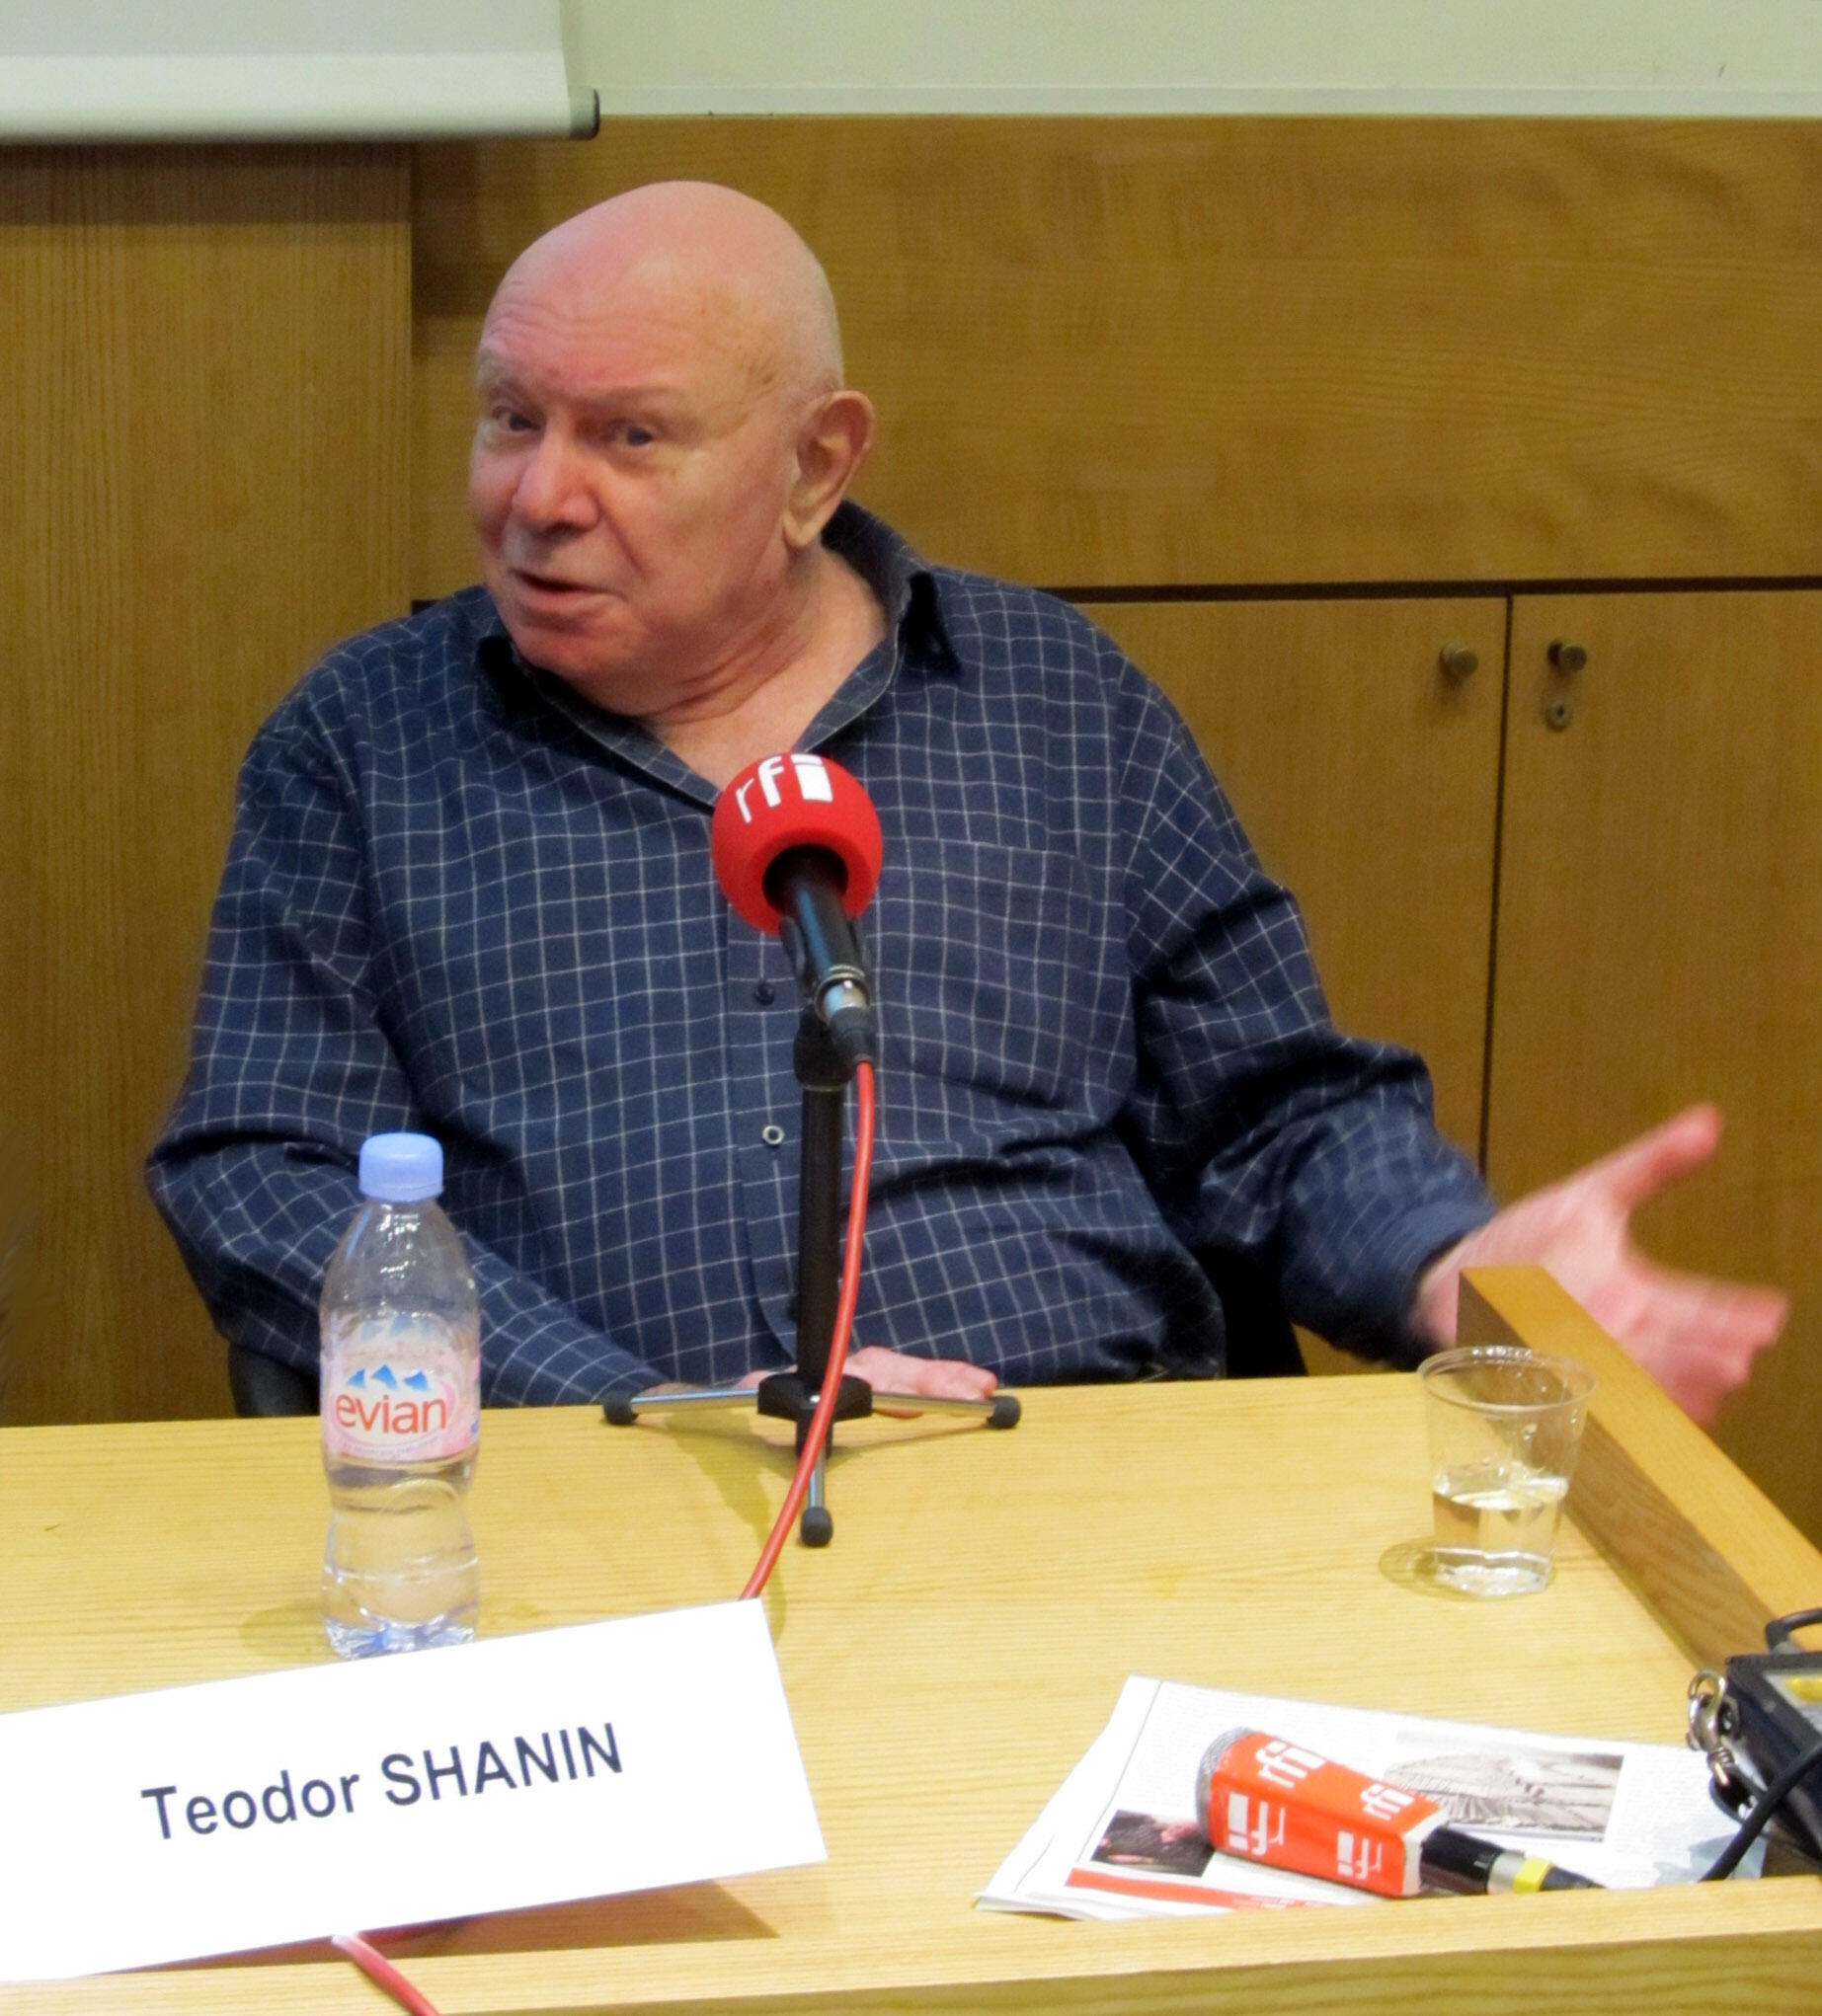 Теодор Шанин на пресс-конференции в Париже. 11 марта 2011 г.